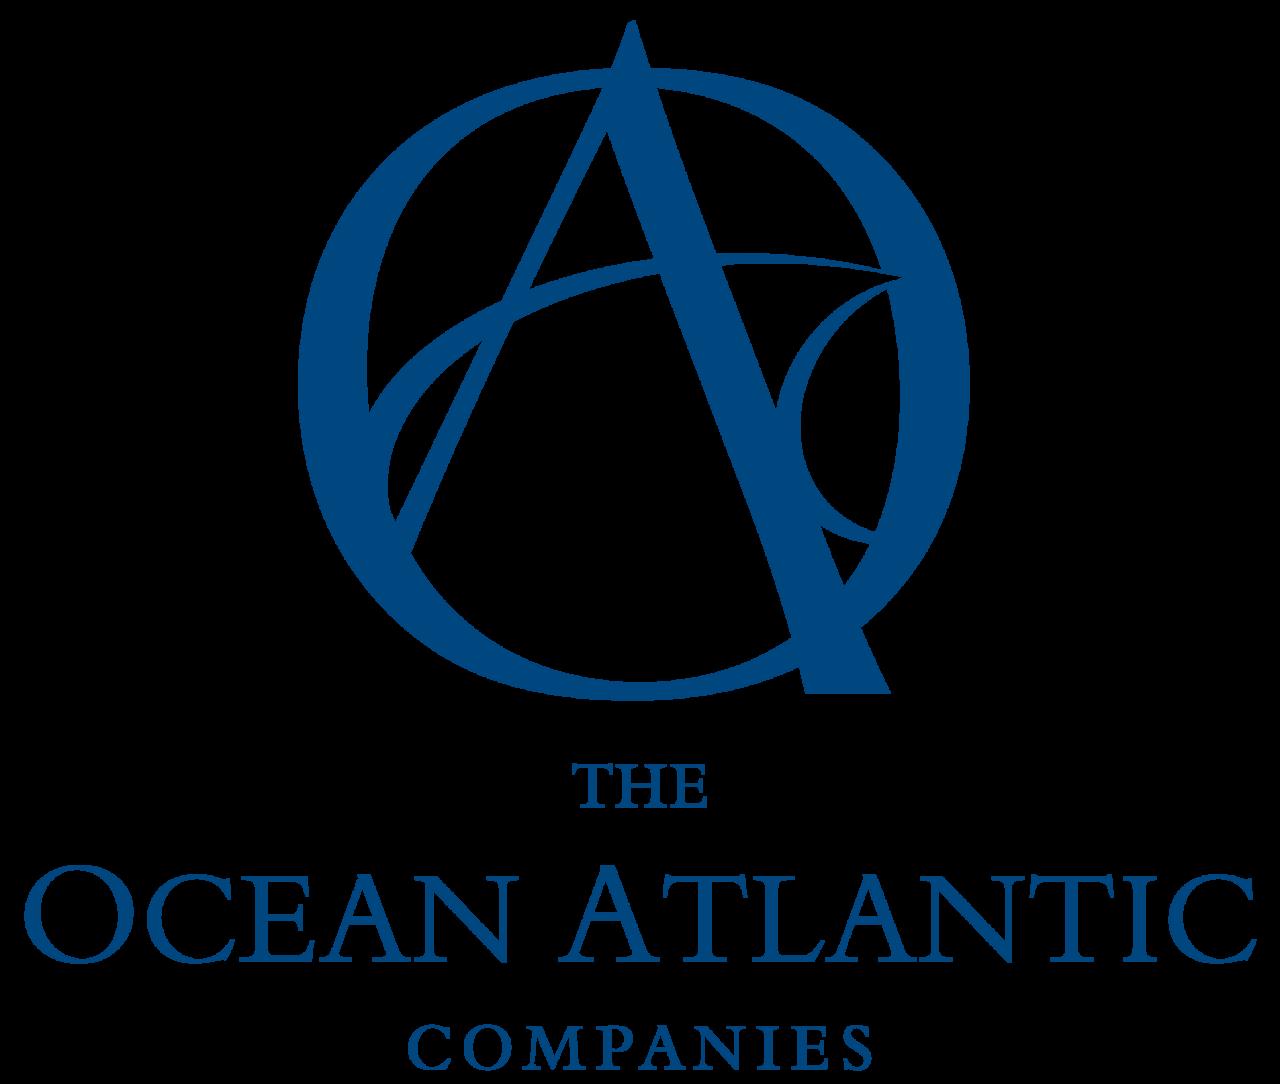 3 – The Ocean Atlantic Companies